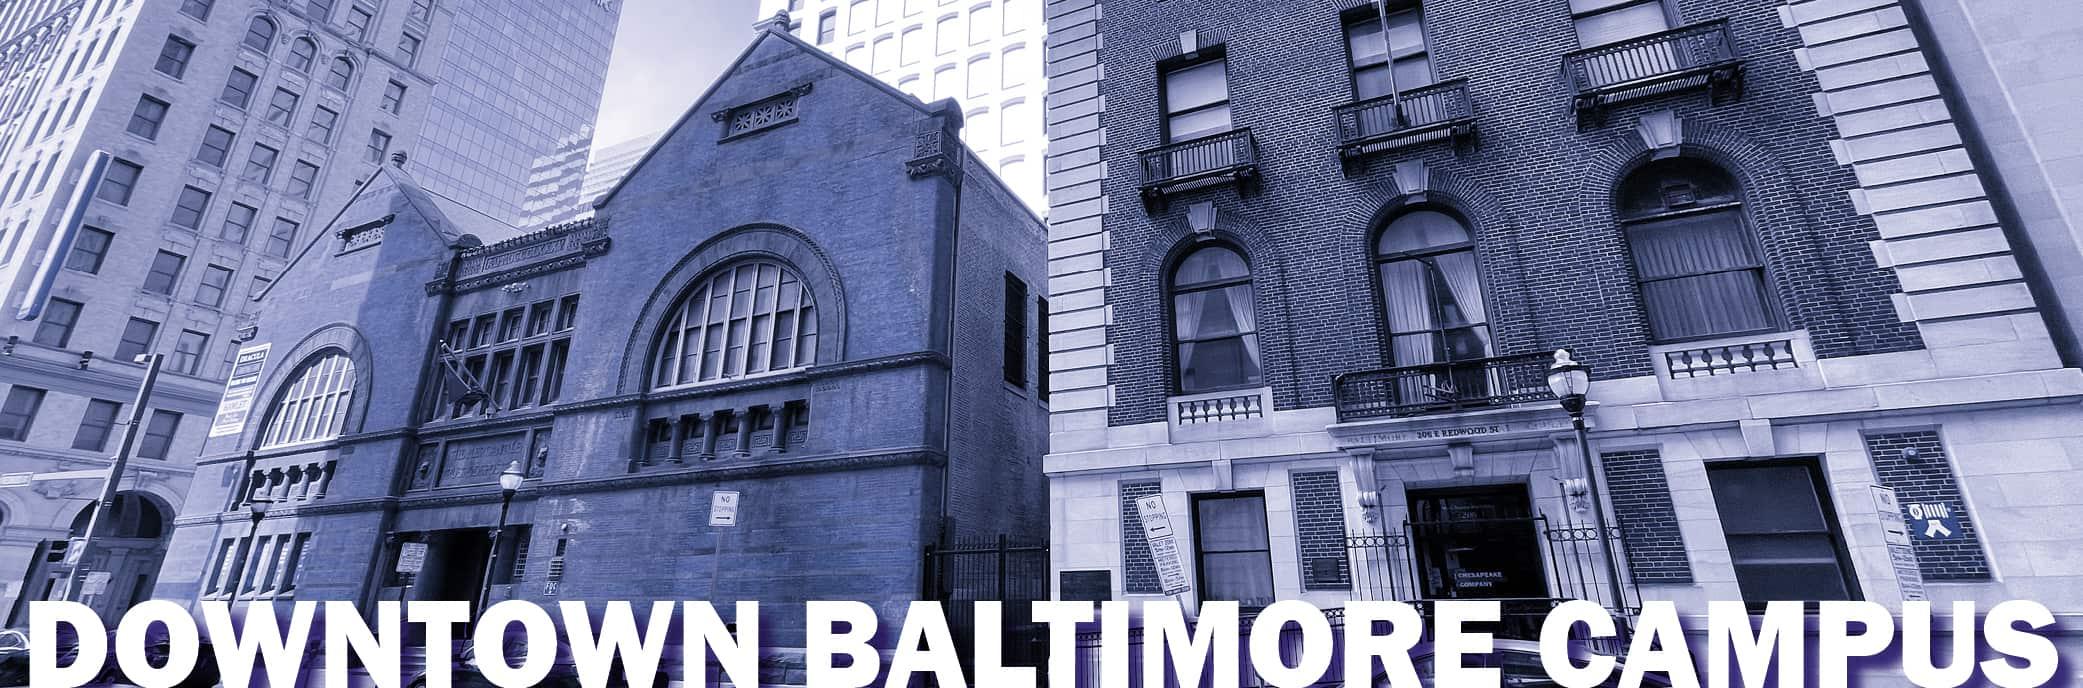 Downtown Baltimore Campus